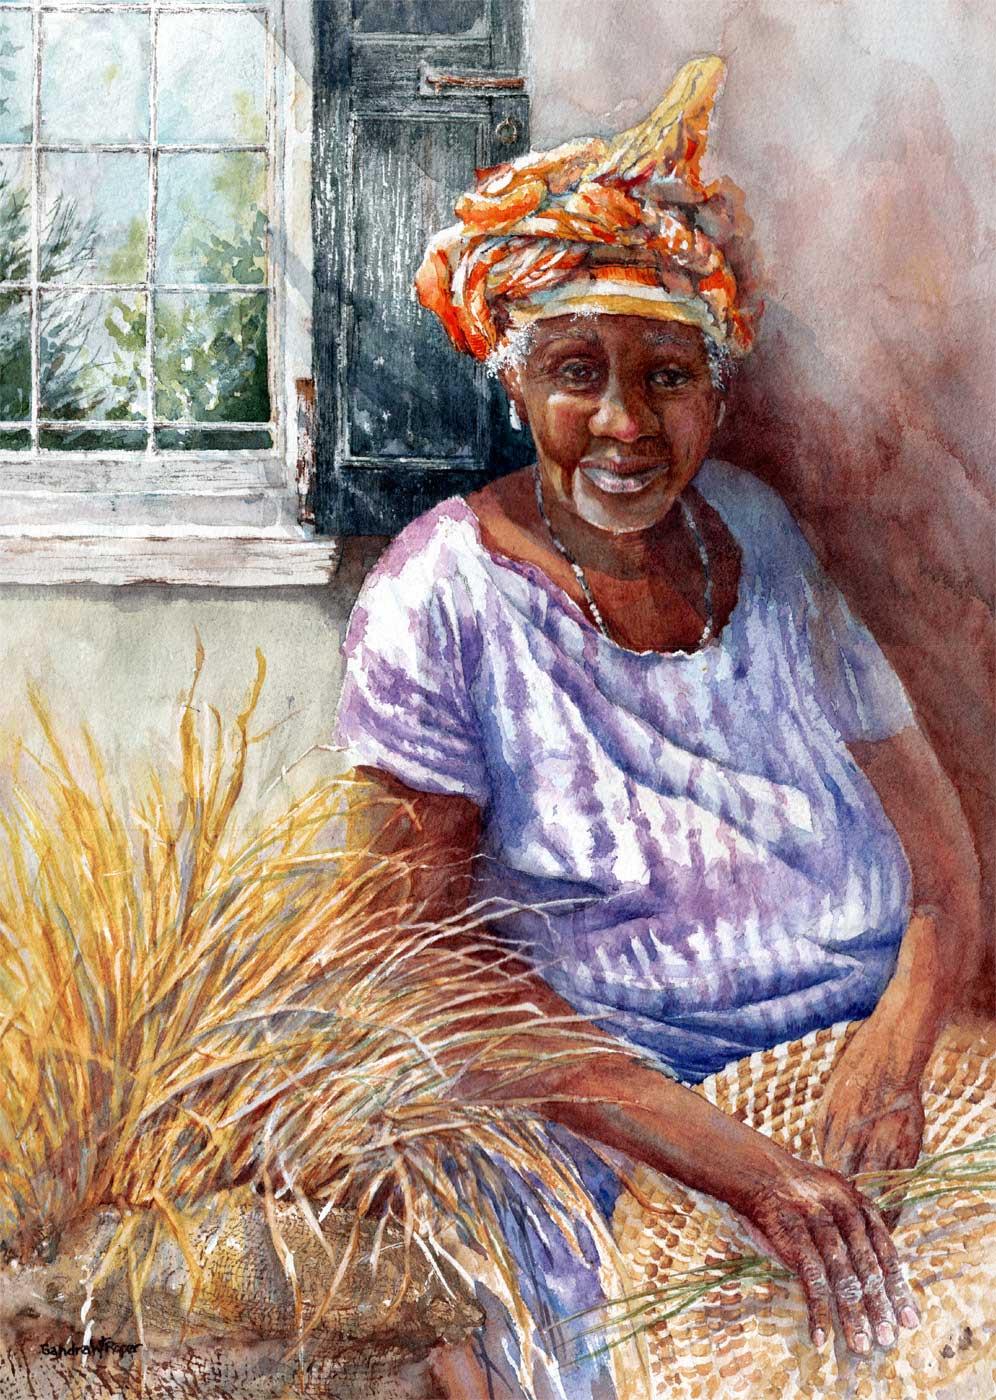 Sweetgrass Basket Maker, Watercolor 16x20 $1350